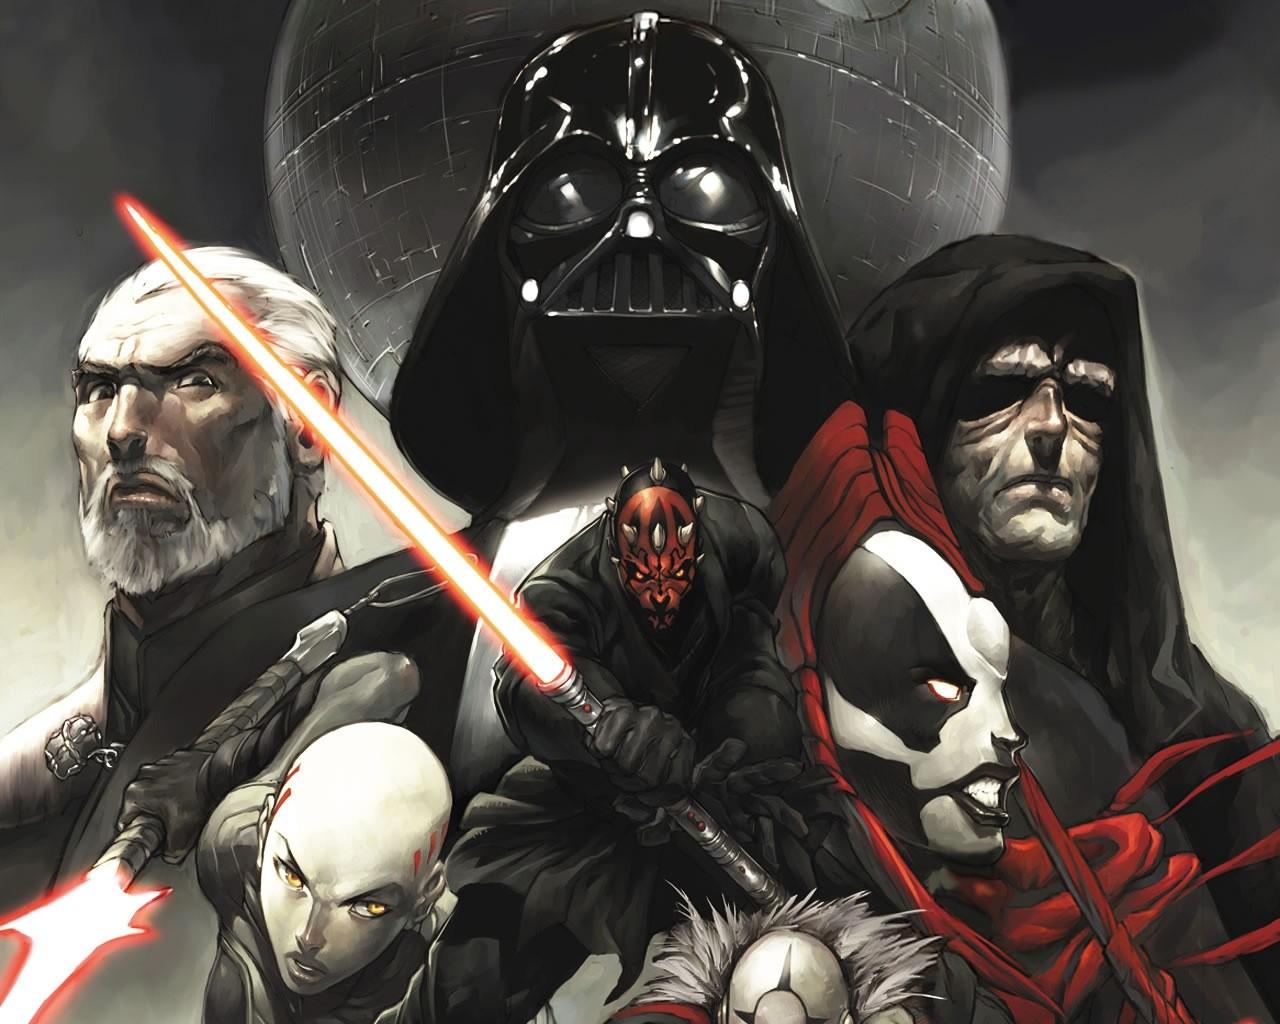 Star Wars Darth Maul Darth Vader Death Star Darth Sidious Star Wars Dark Side Sith Lords 1280x1024 Wallpaper Teahub Io